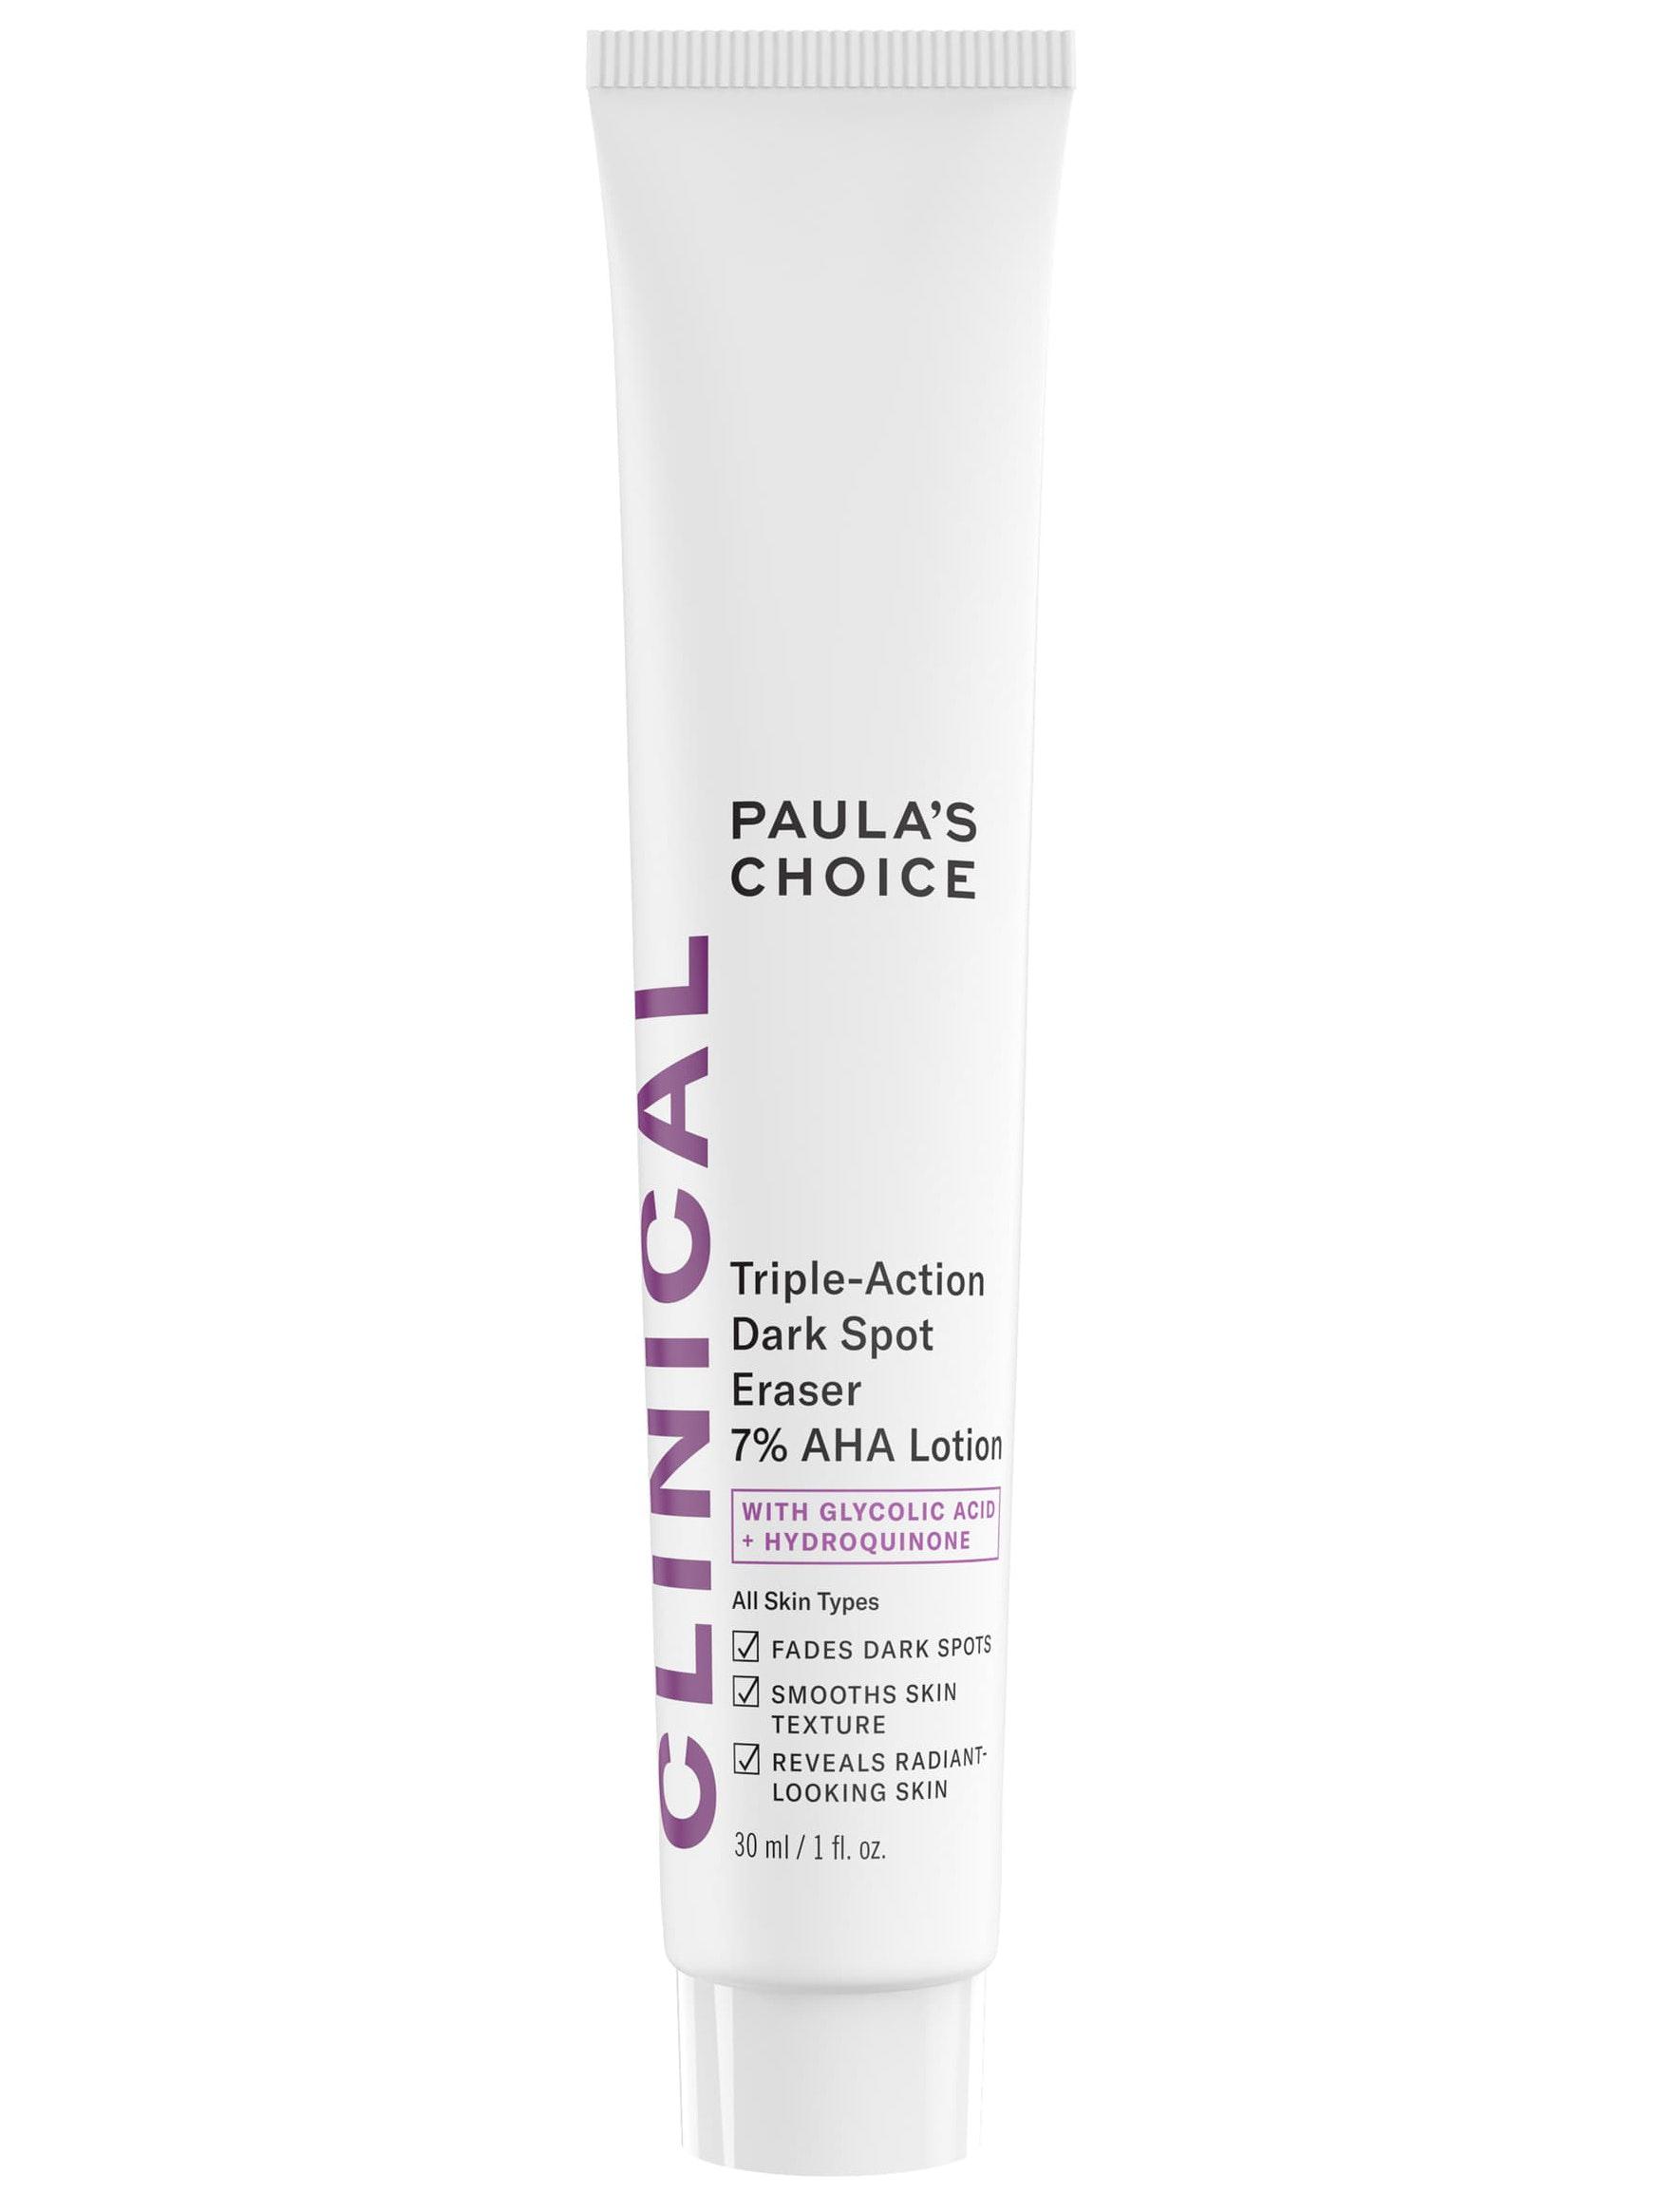 Paula's choice dark spot treatment